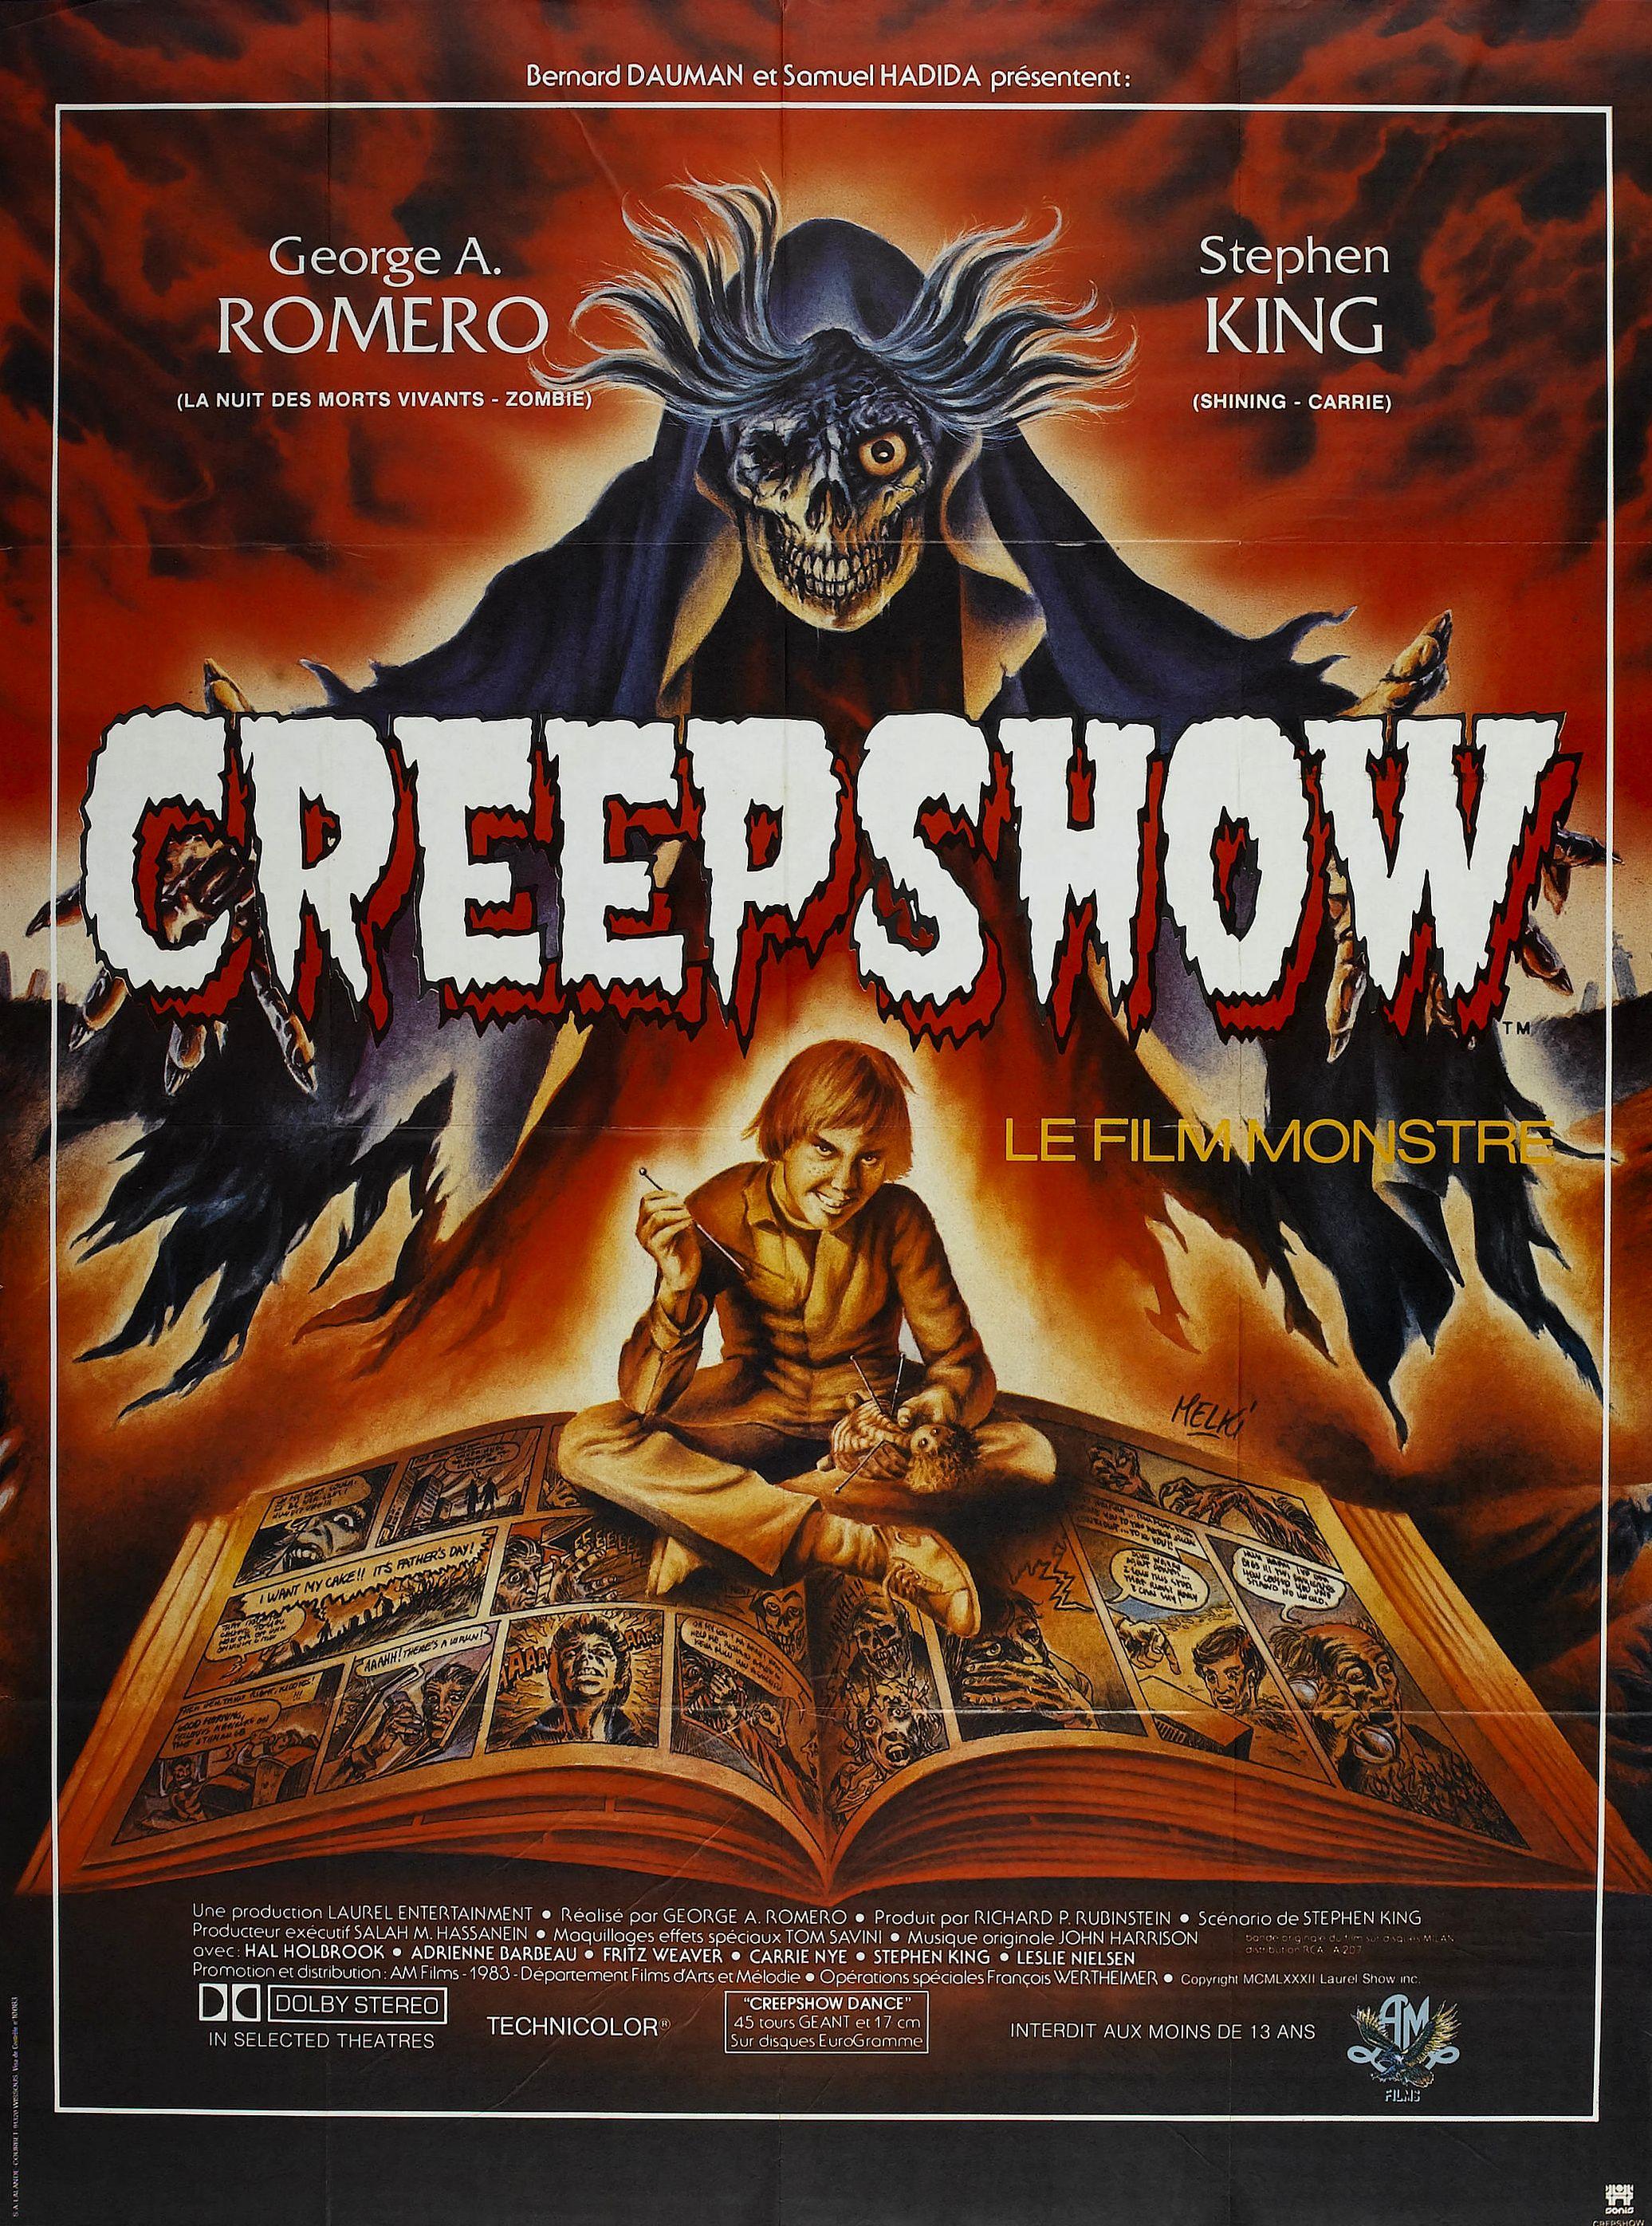 creepshow review one guy rambling